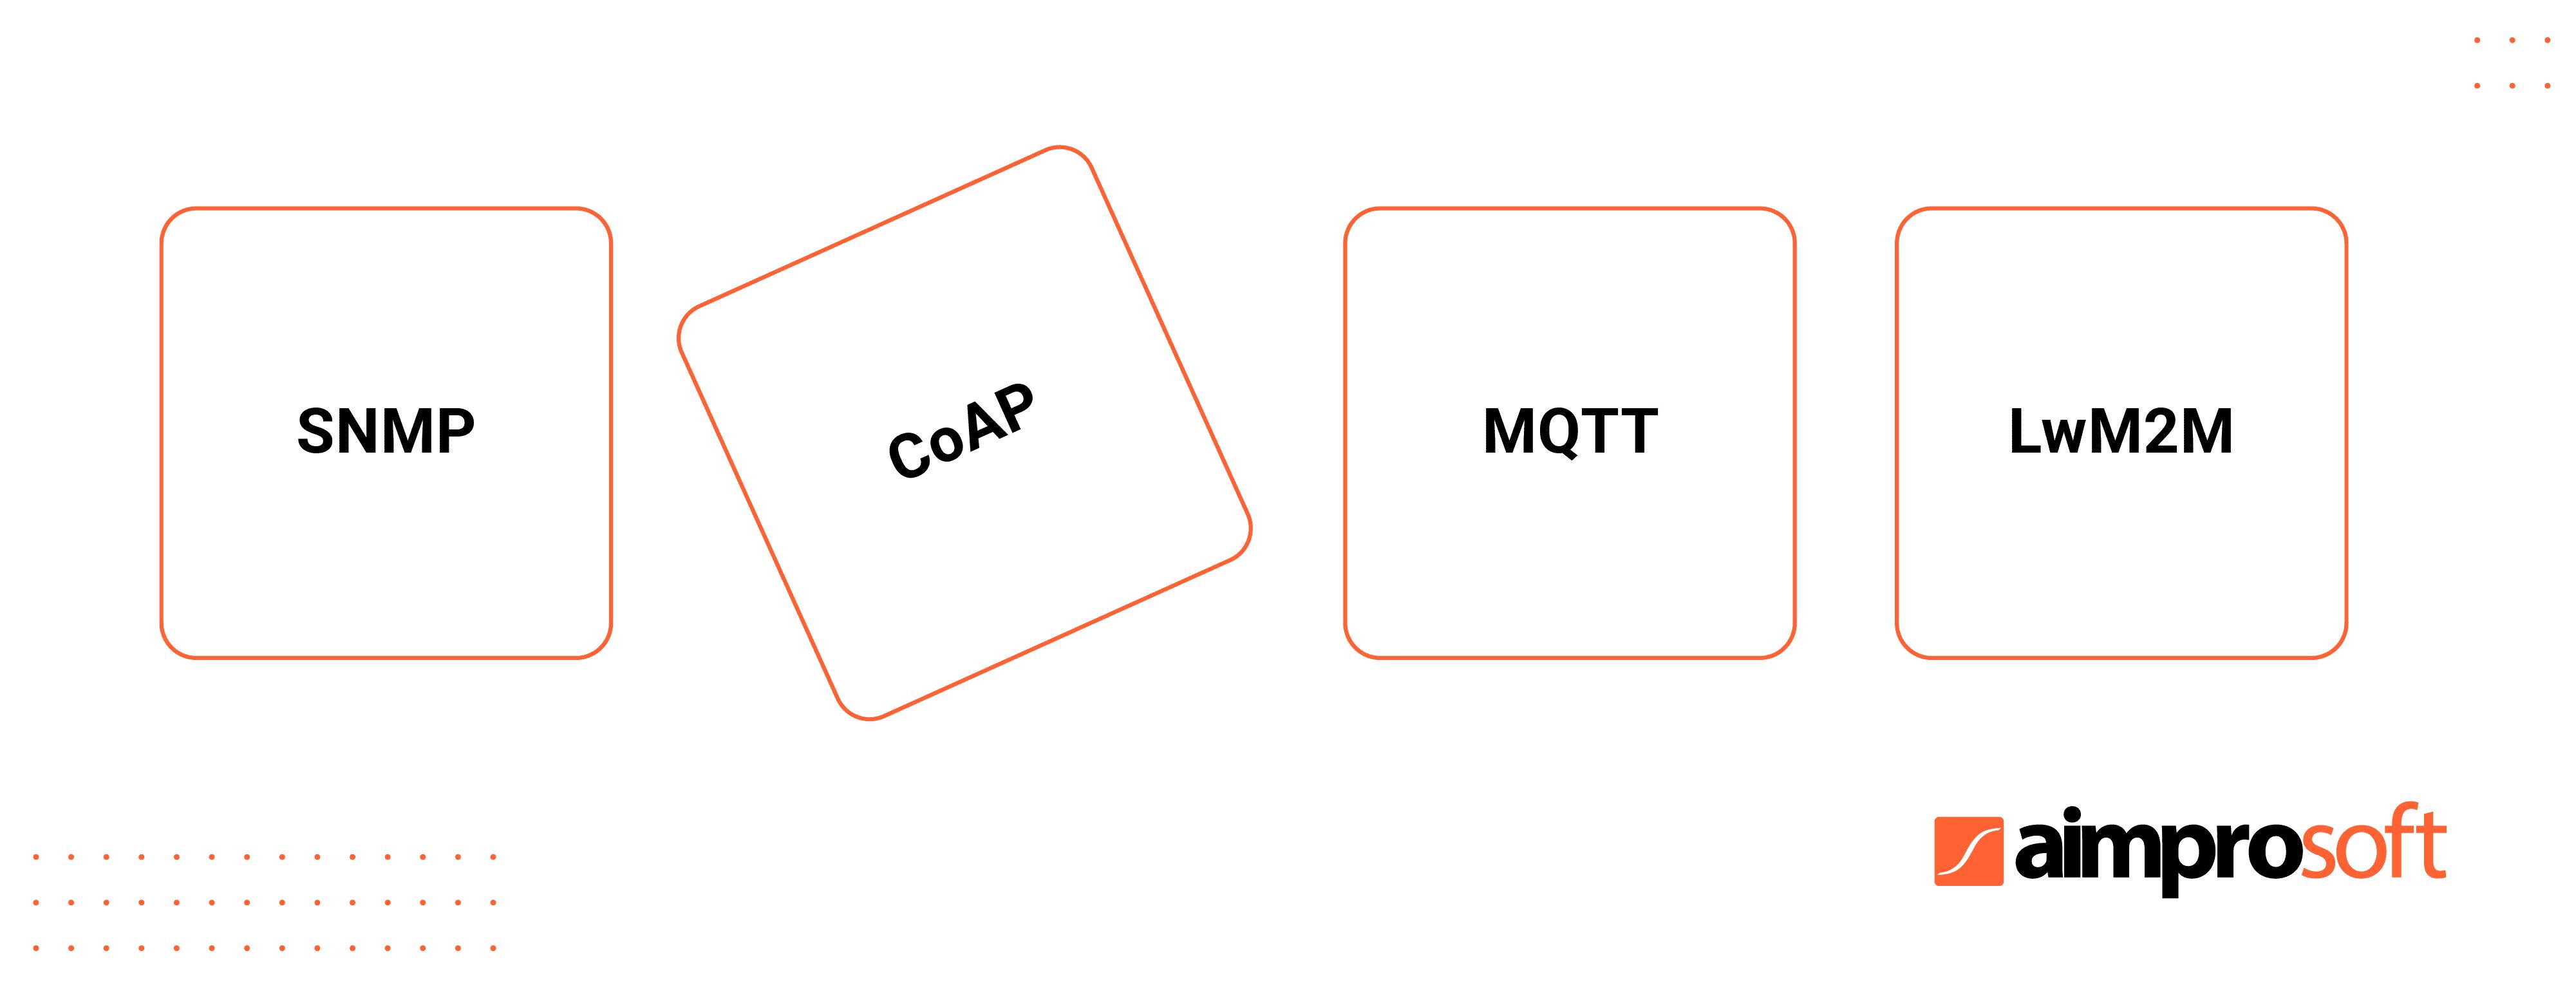 Several standard IoT communication protocols